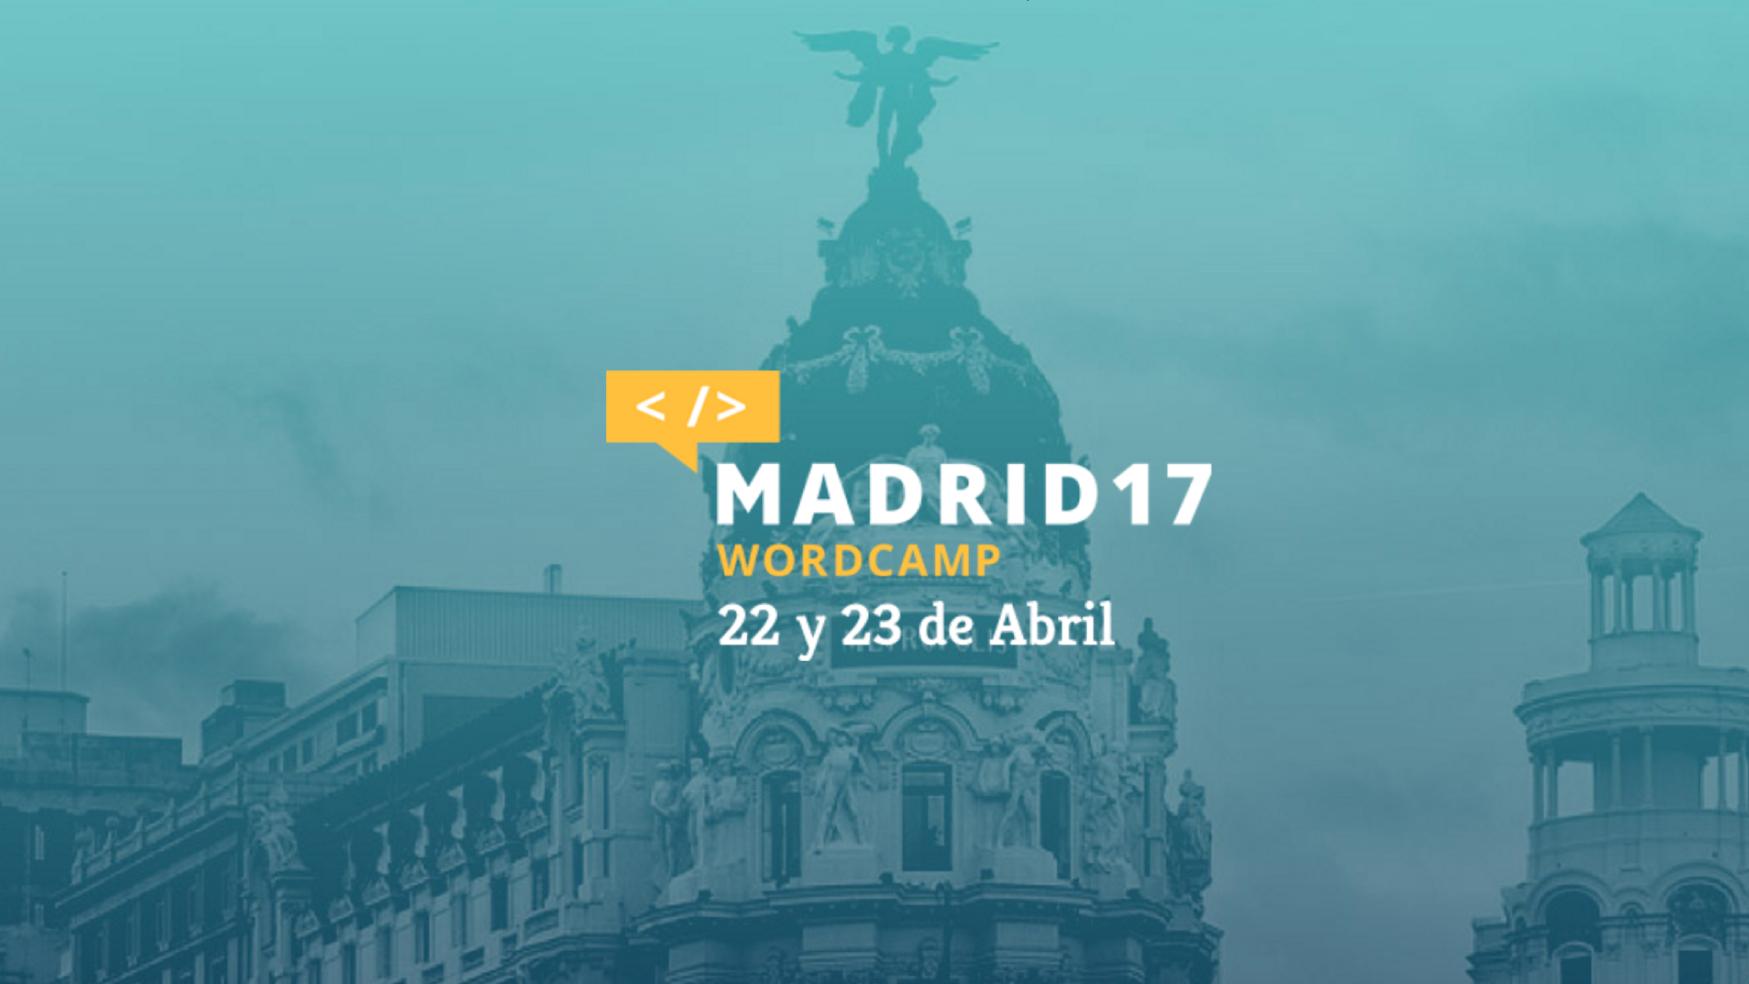 wordcamp madrid 2017